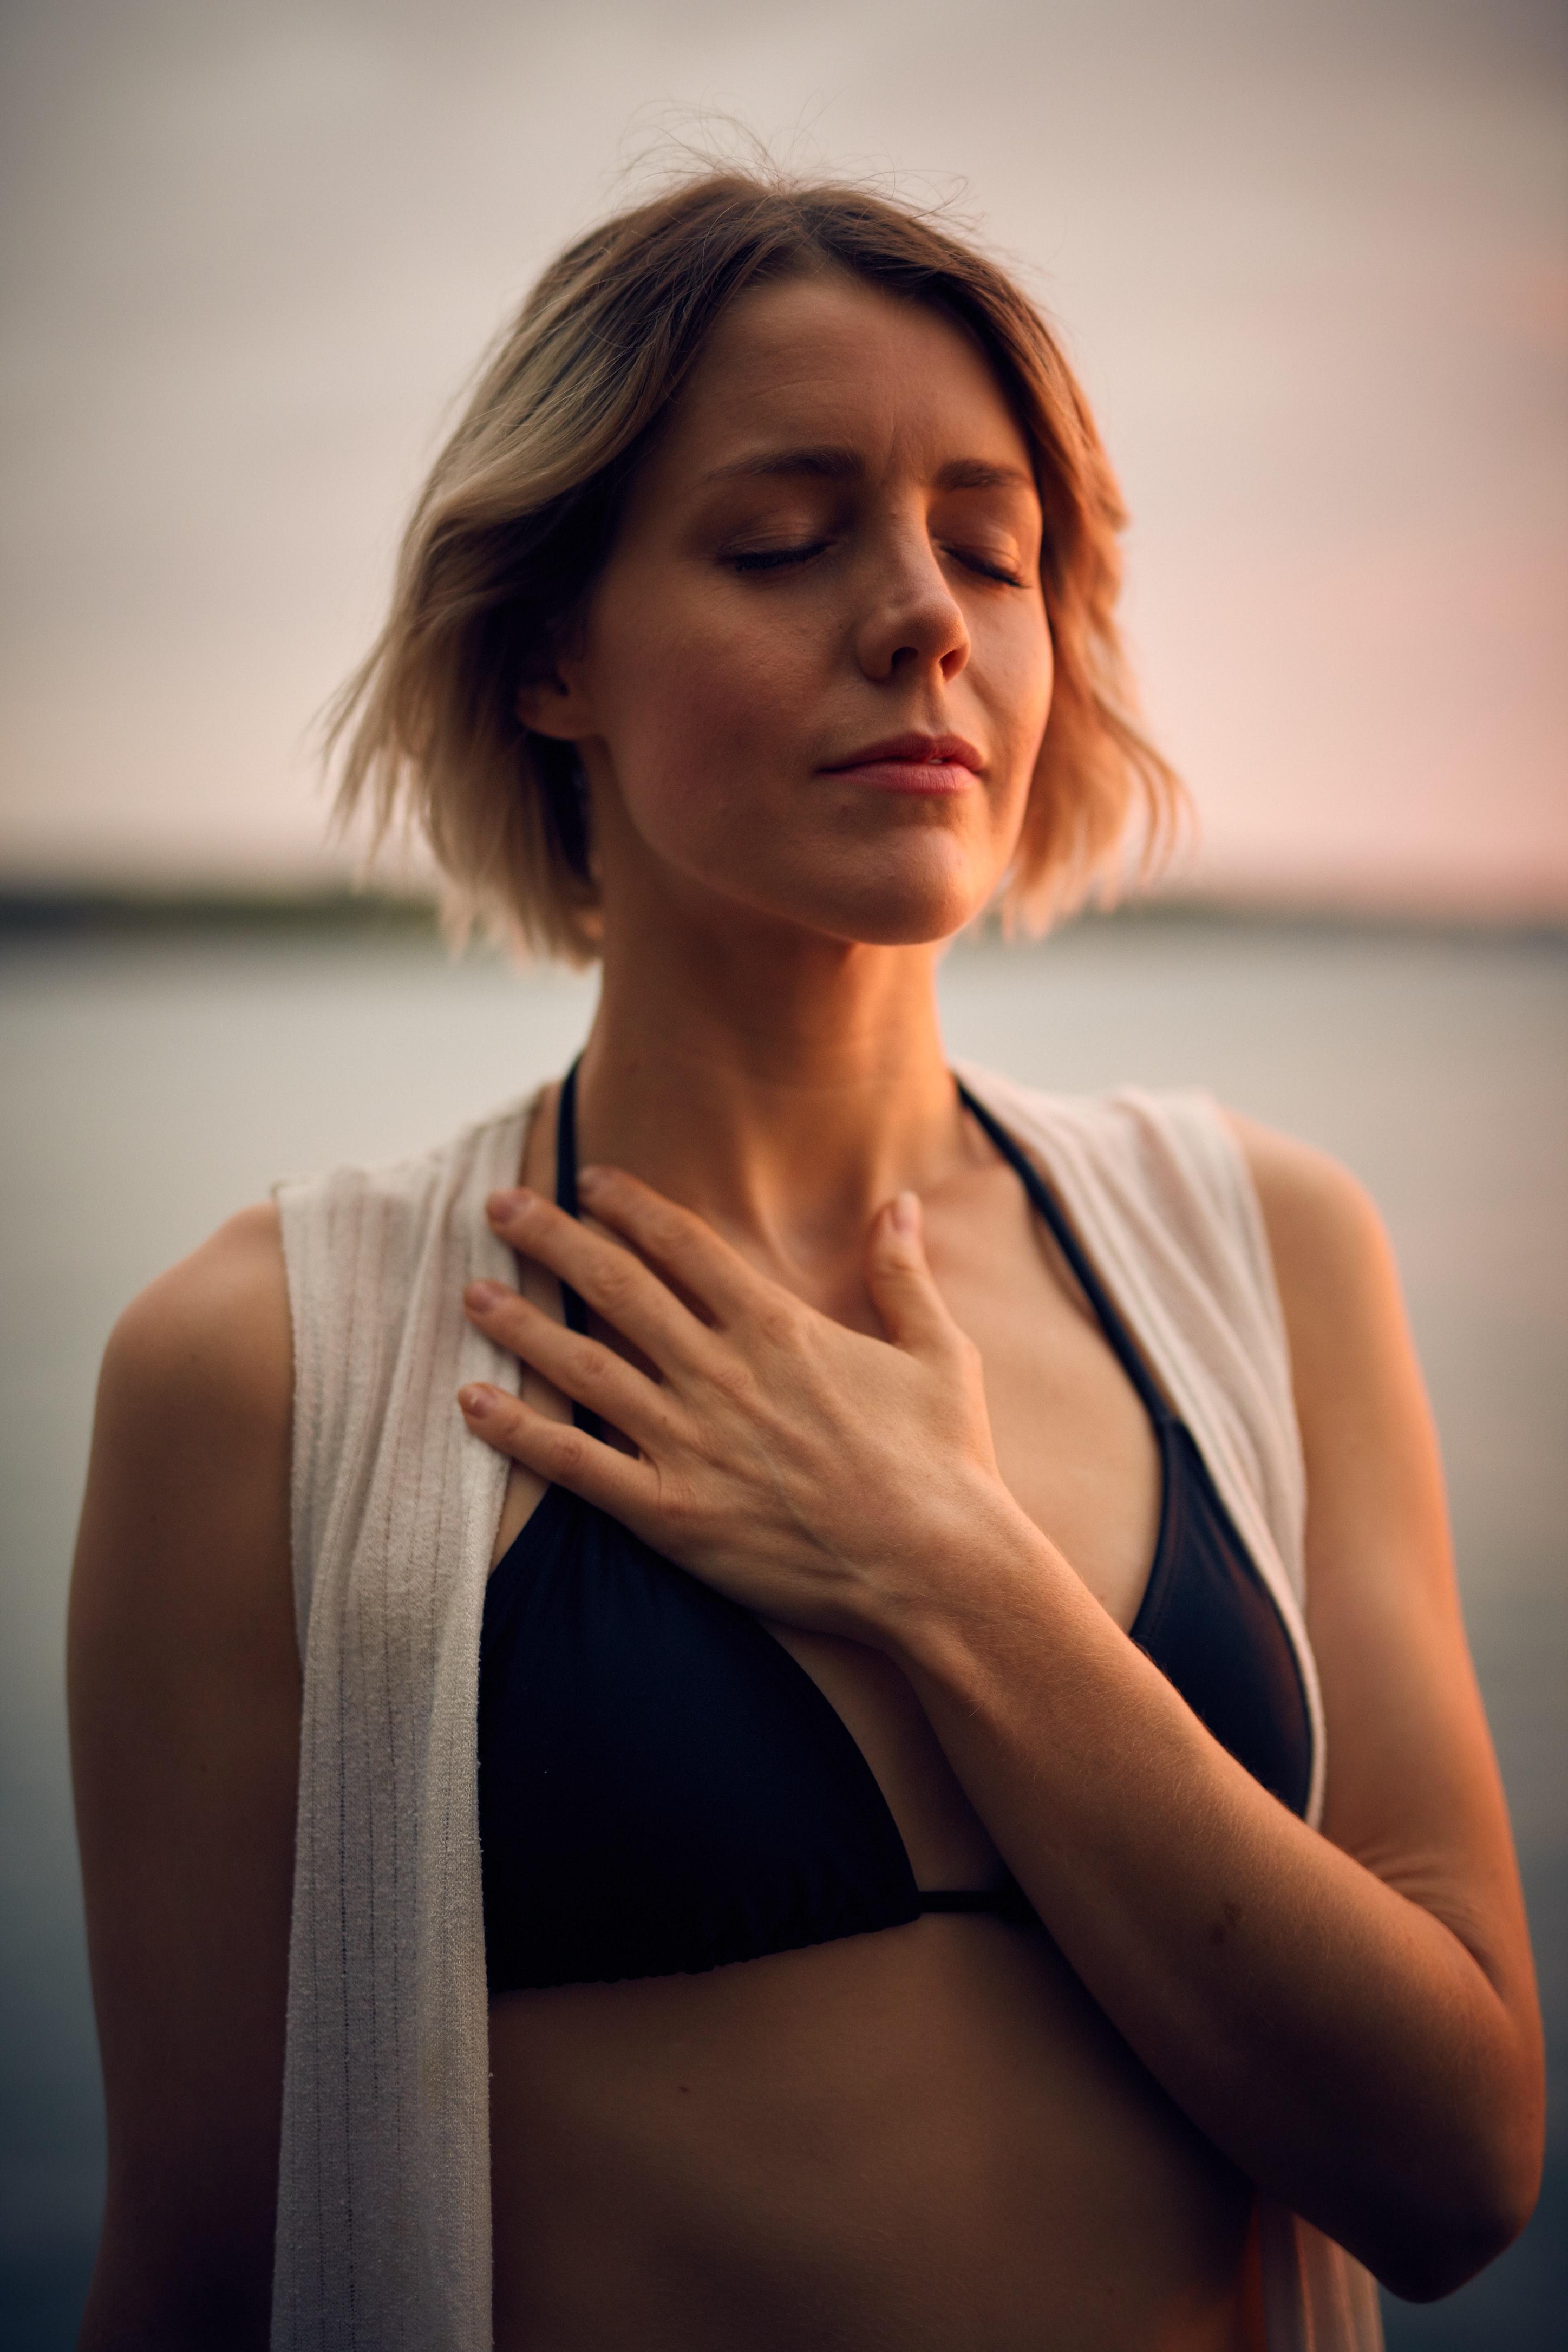 Intravenöse Sauerstoff-Therapie